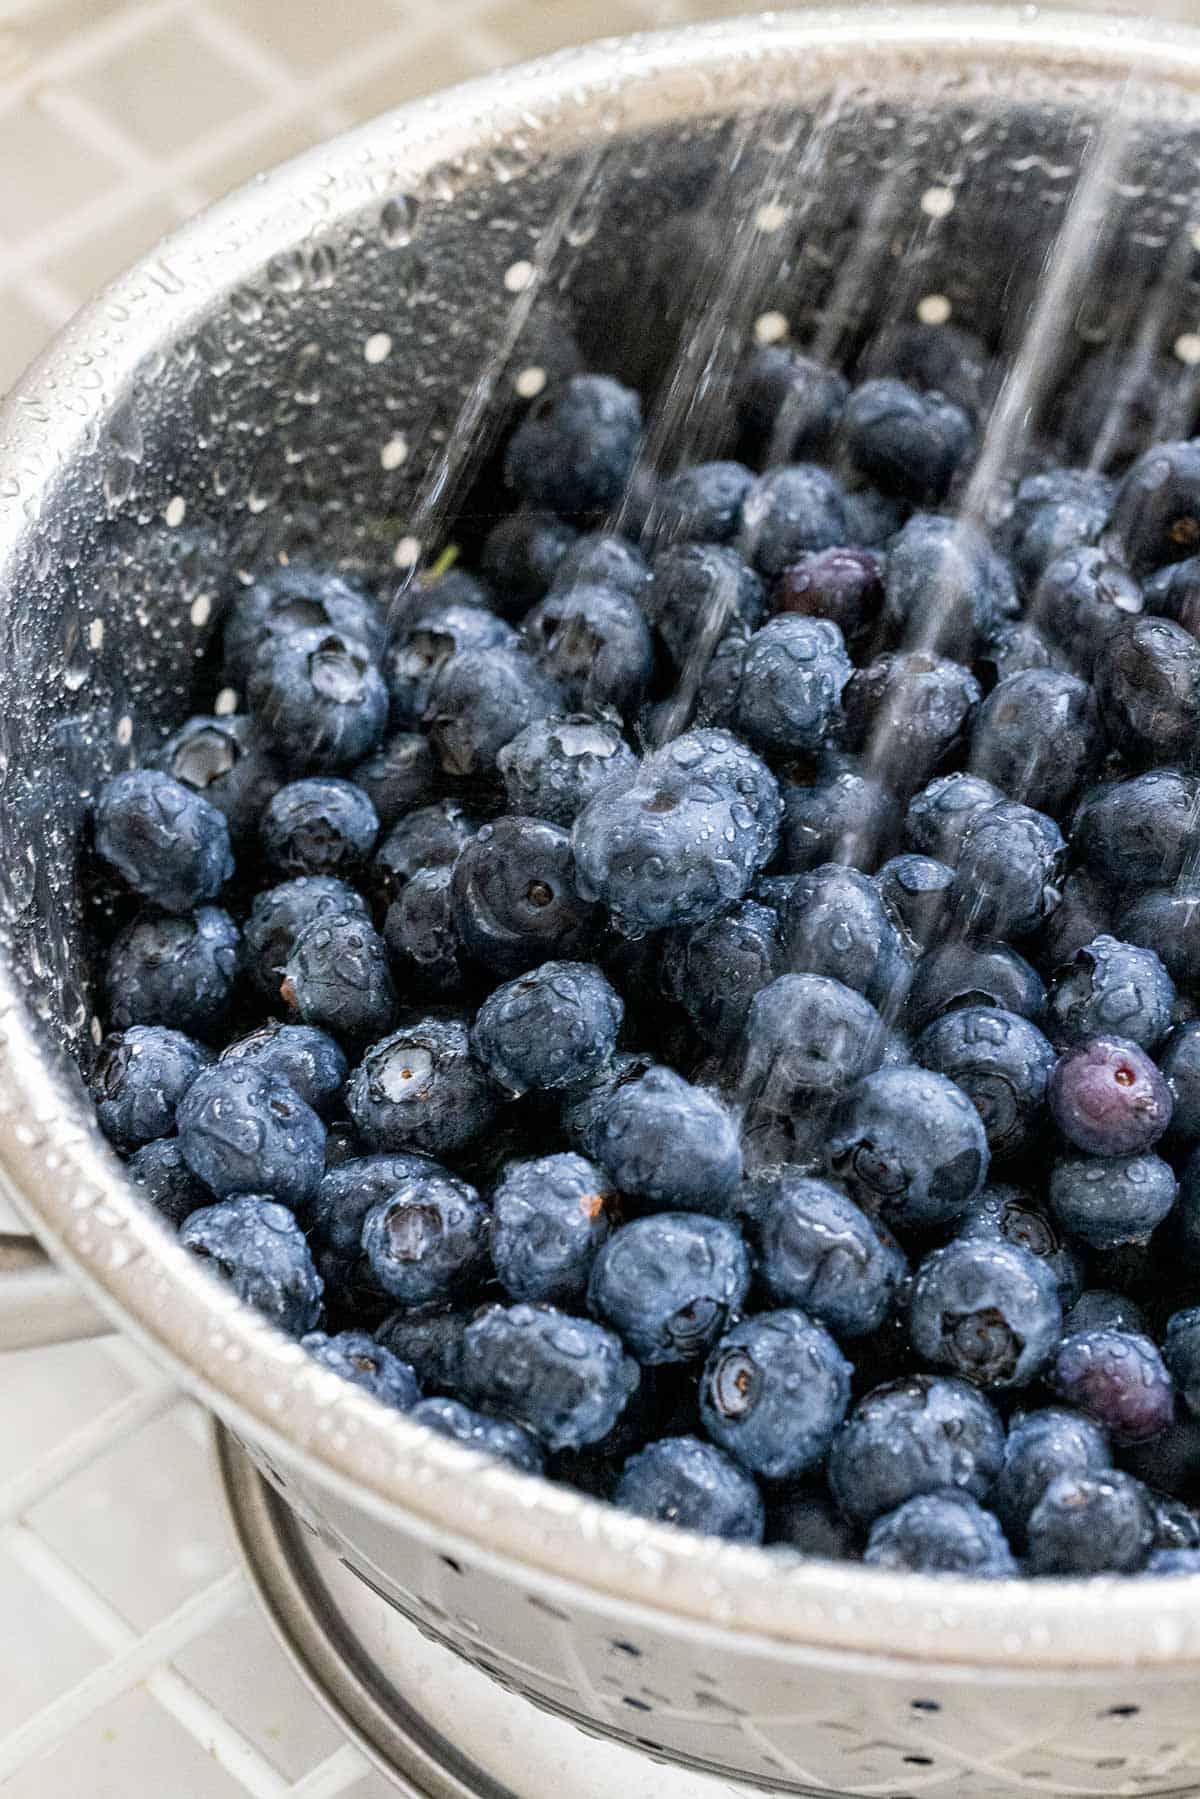 washing blueberries in a colander